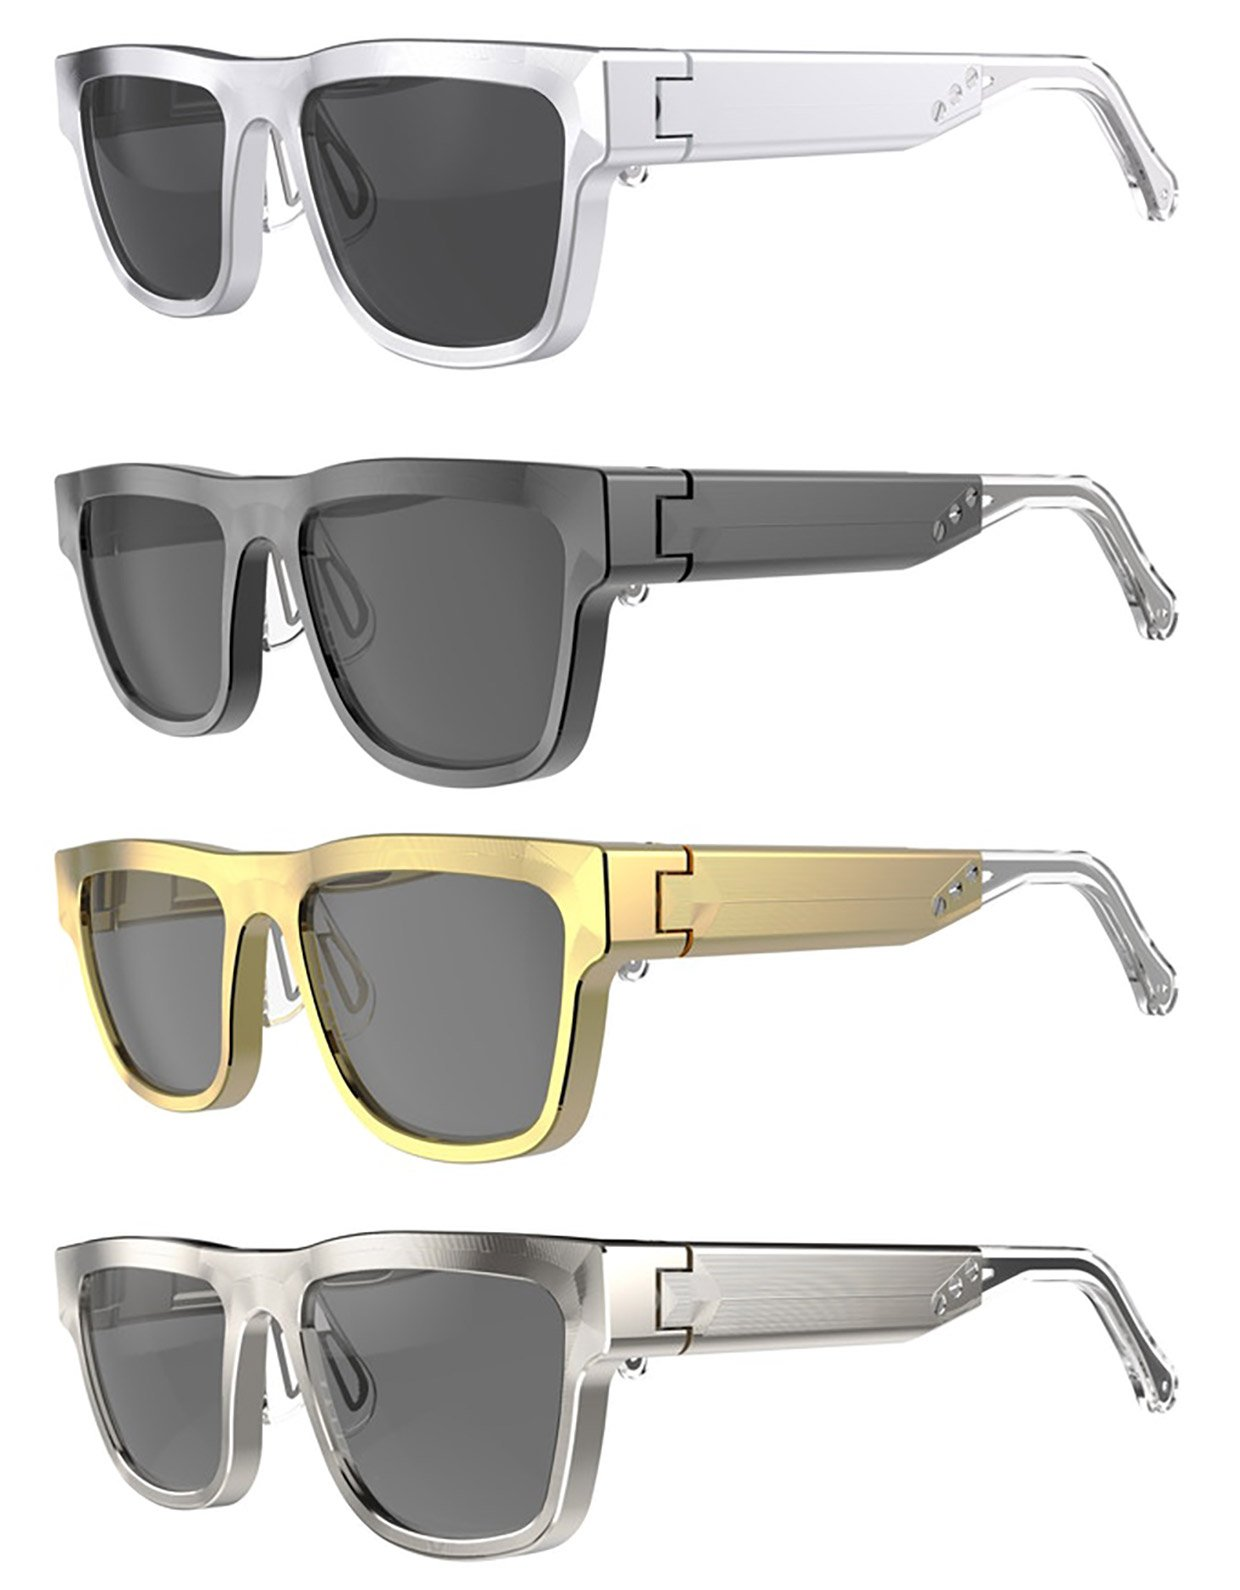 Kingsland Aluminum Eyeglass Frames